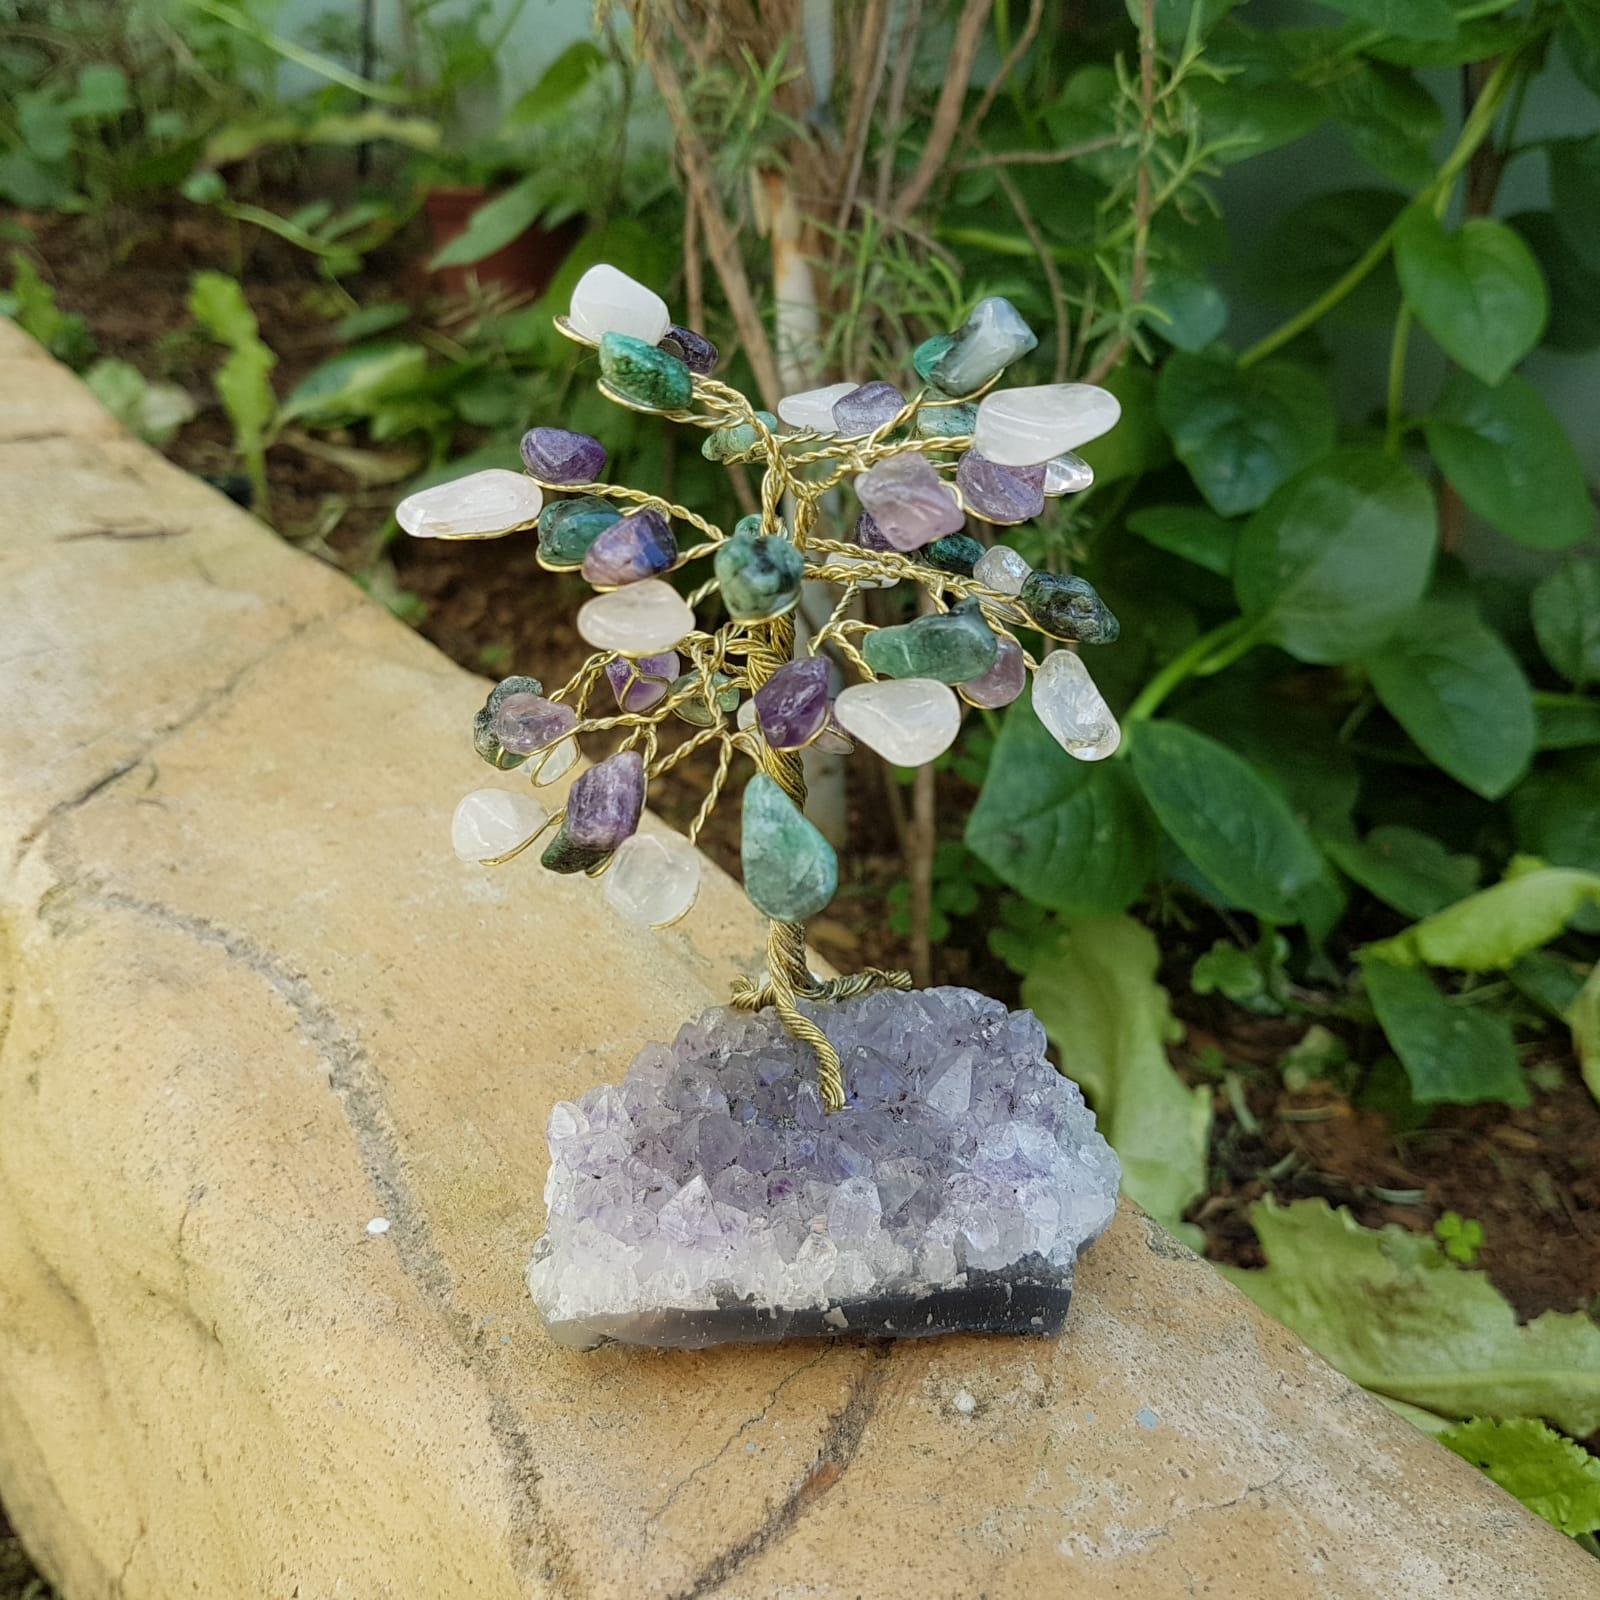 Árvore Bonsai de Cristais de Esmeralda - Ametista - Quartzo Rosa